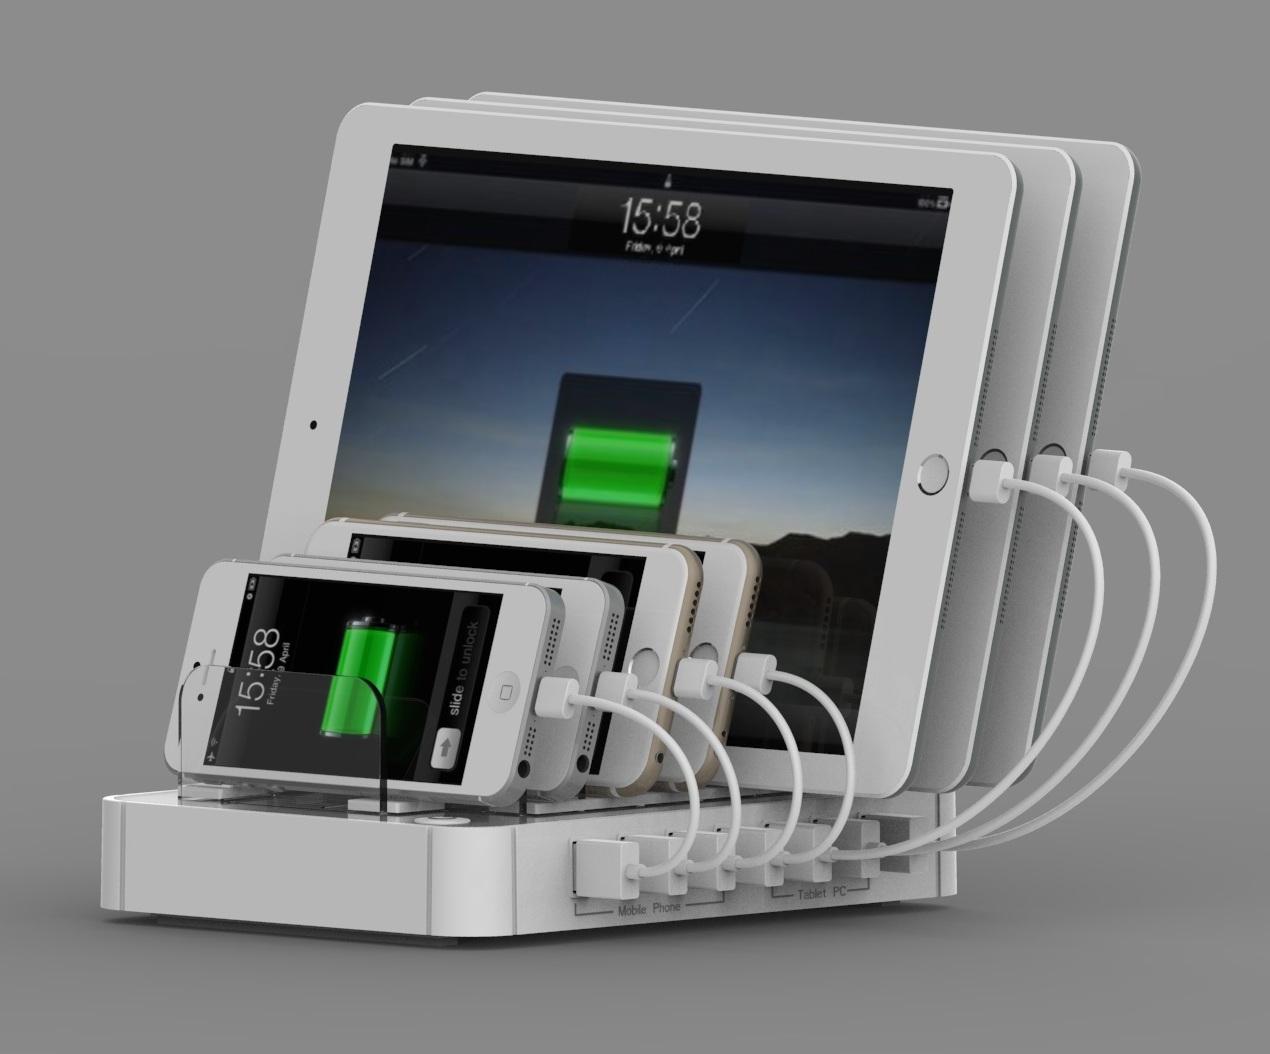 7 PORT USB CHARGER STATIONConsumer Electronics